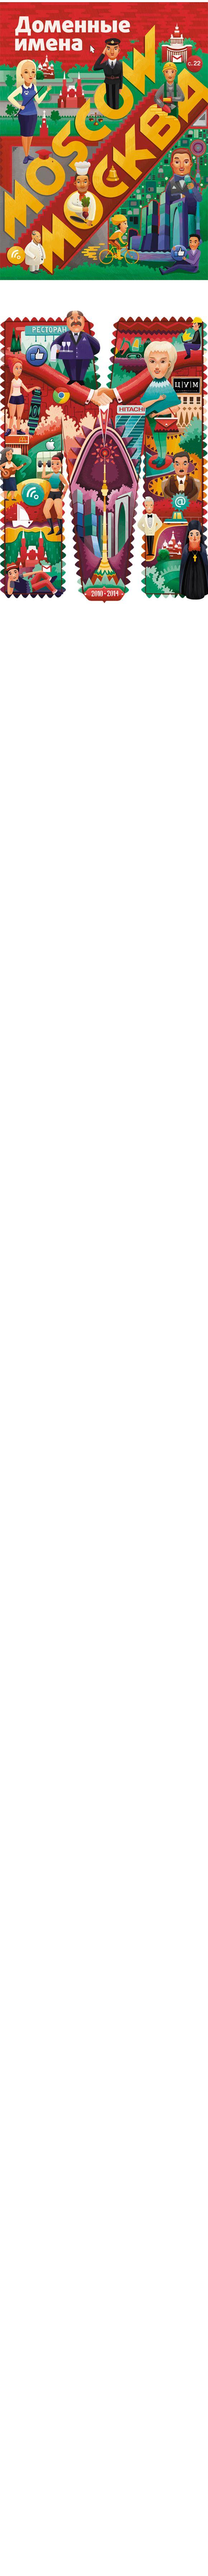 Аtelier Afisha. Edition of Domain Names. Autumn 2014 on Behance